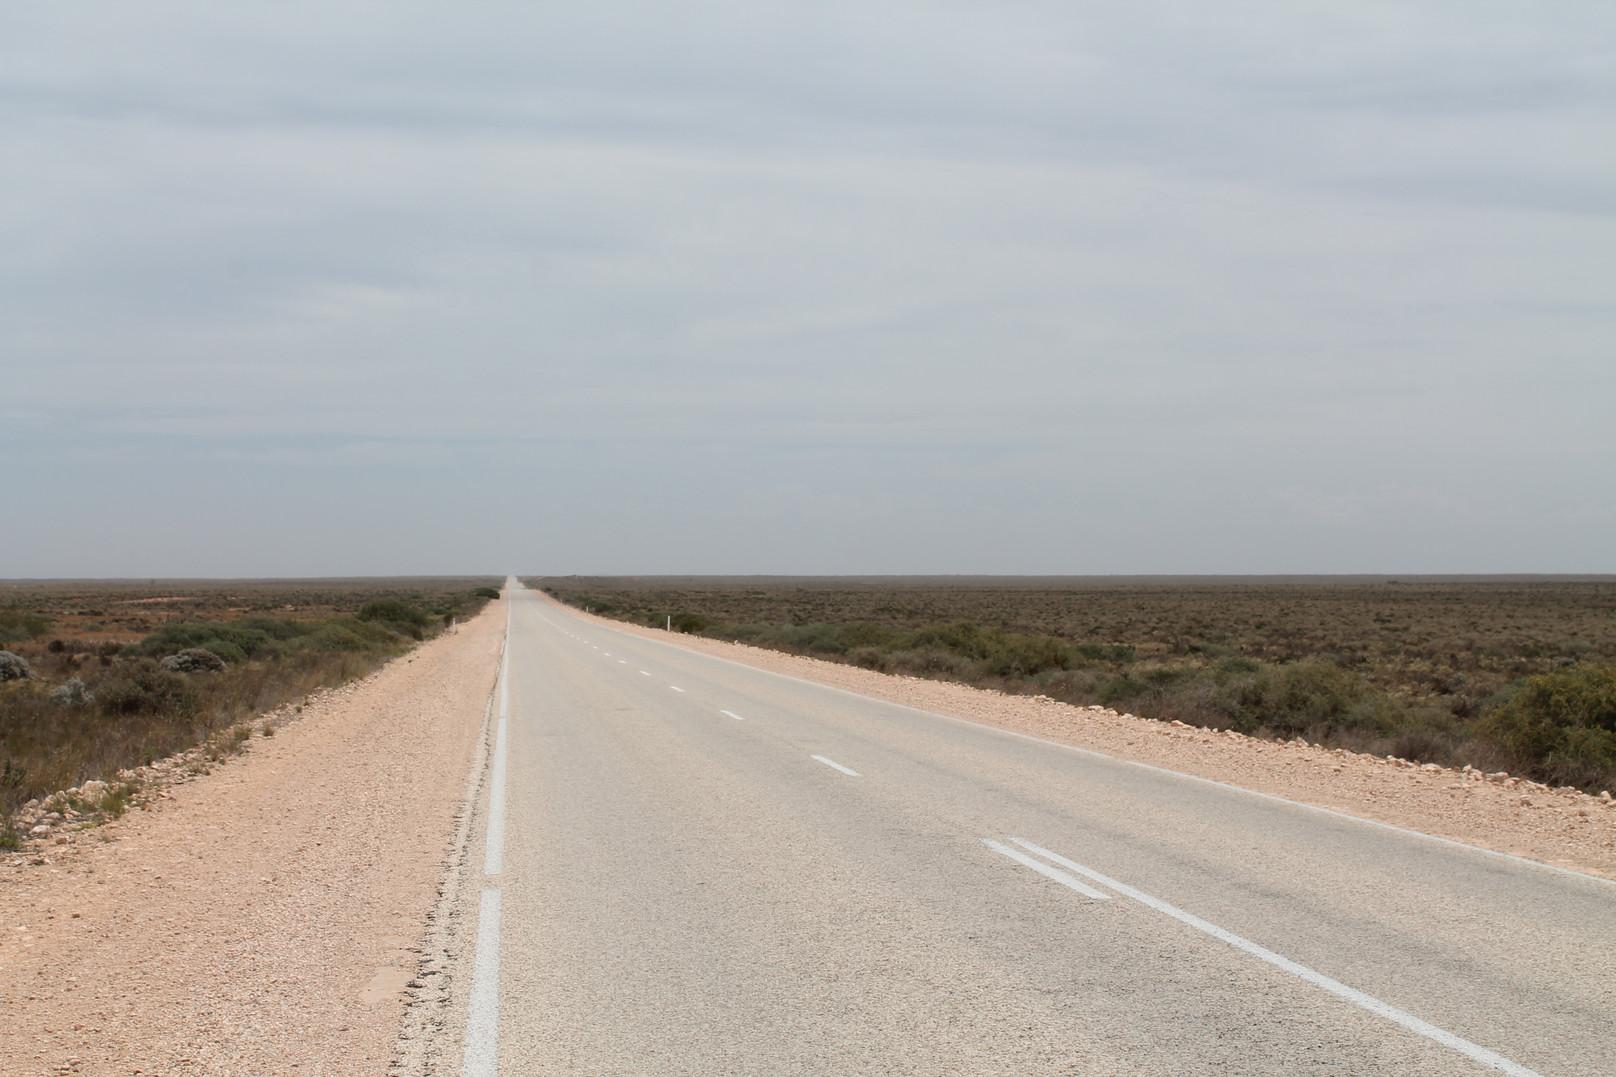 Eyre Highway through the Nullarbor